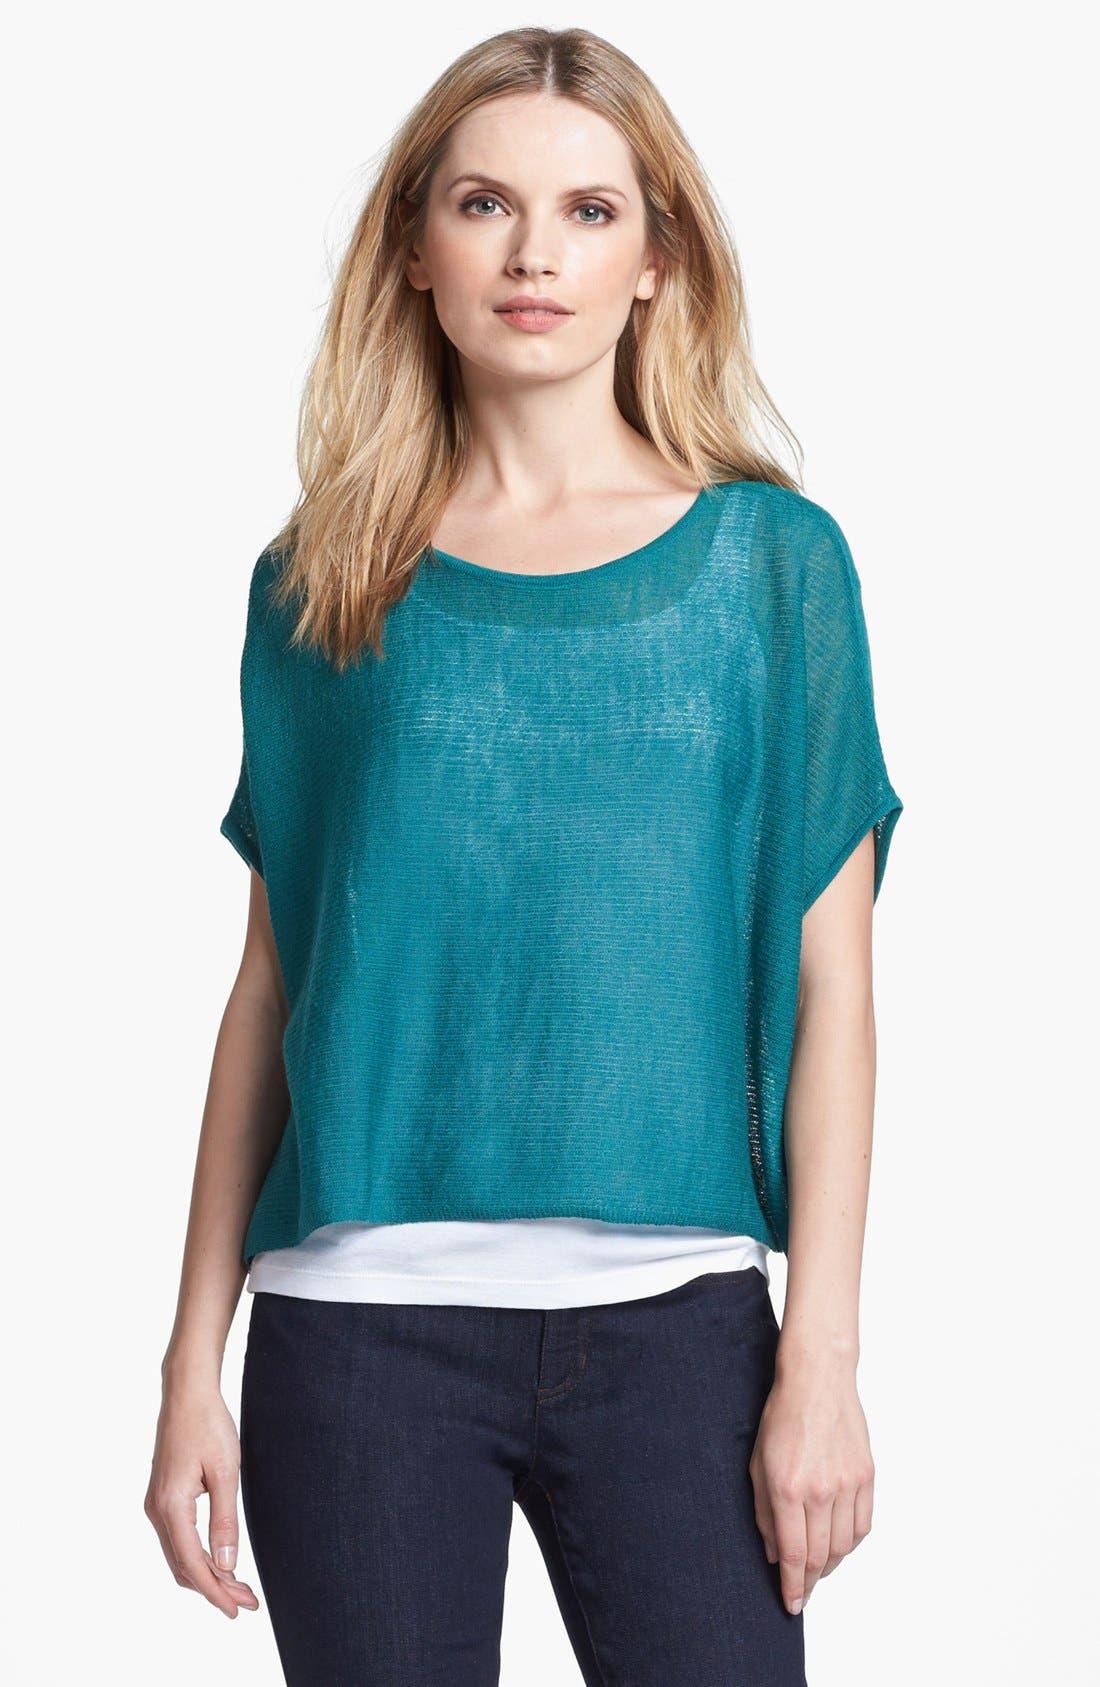 Main Image - Eileen Fisher 'Ethereal Wool' Short Poncho Top (Regular & Petite)